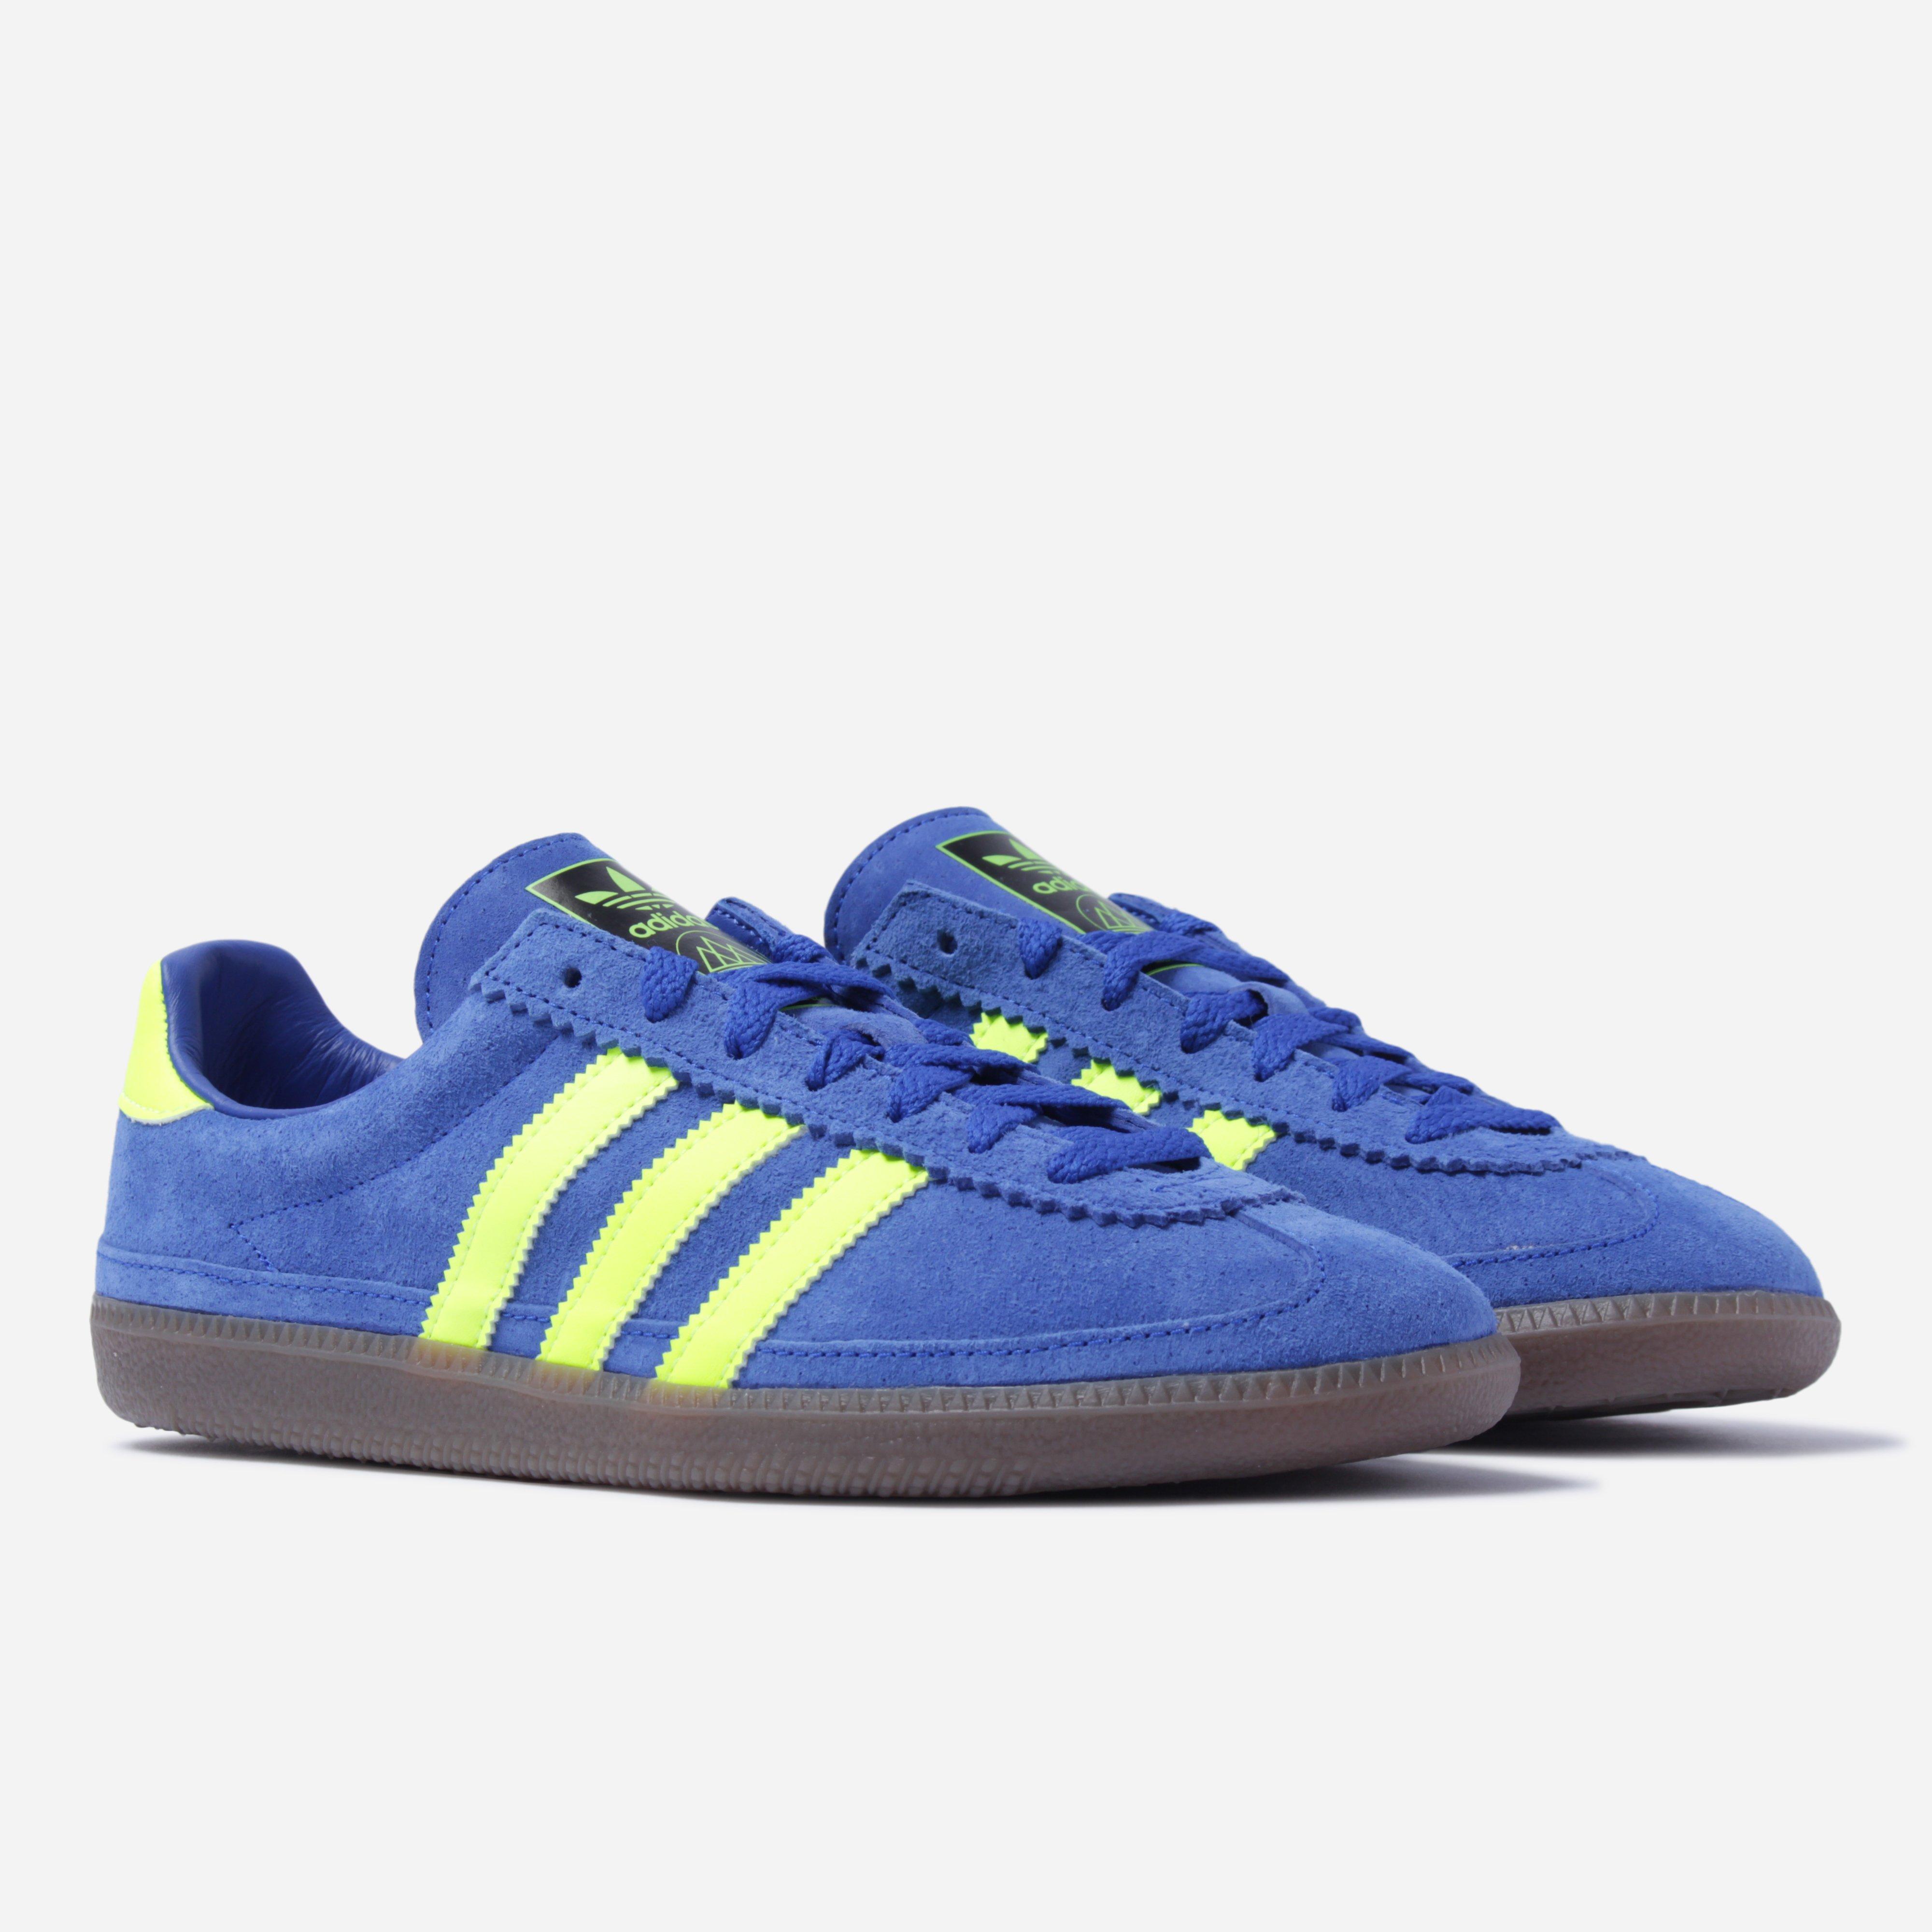 1977ff4a4618 Lyst - adidas Originals Whalley Spzl in Blue for Men